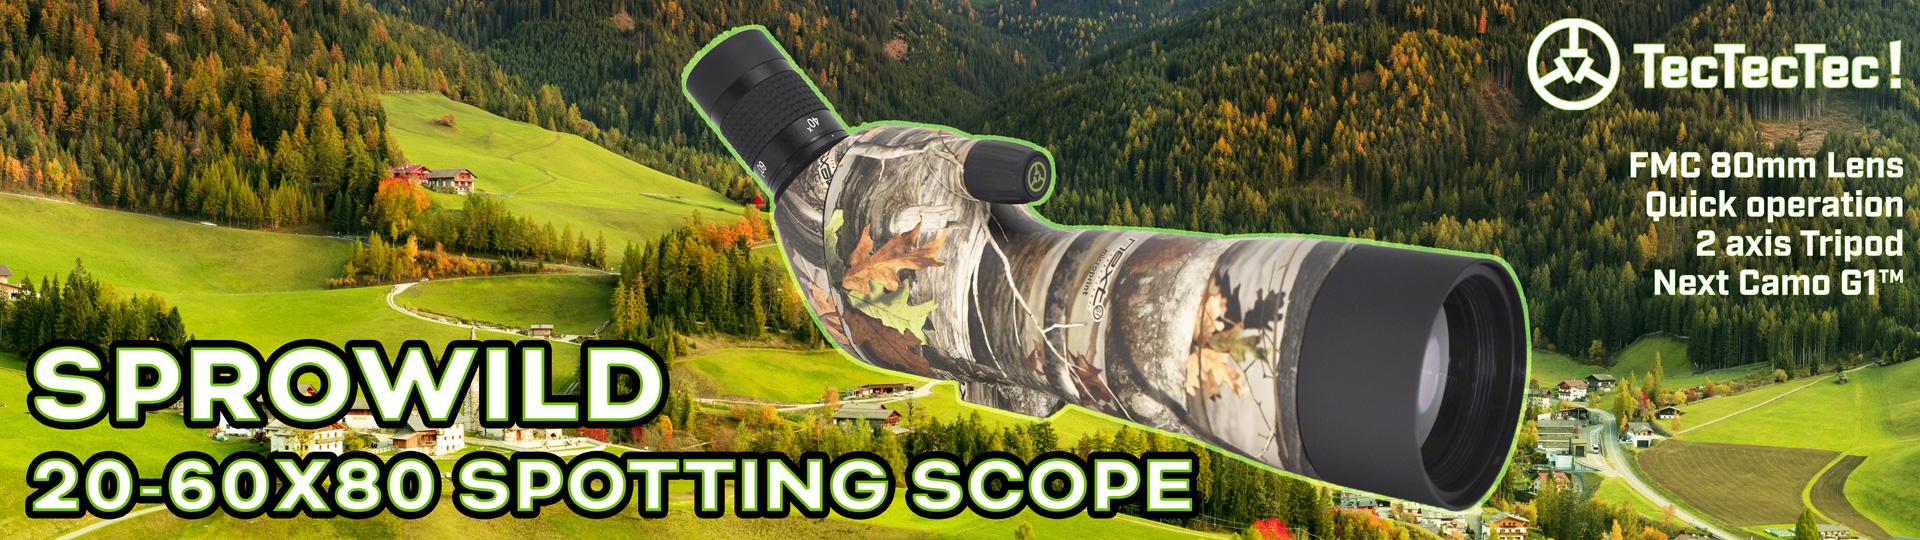 SPROWILD Slide Banner Spotting scope Hunting TecTecTec